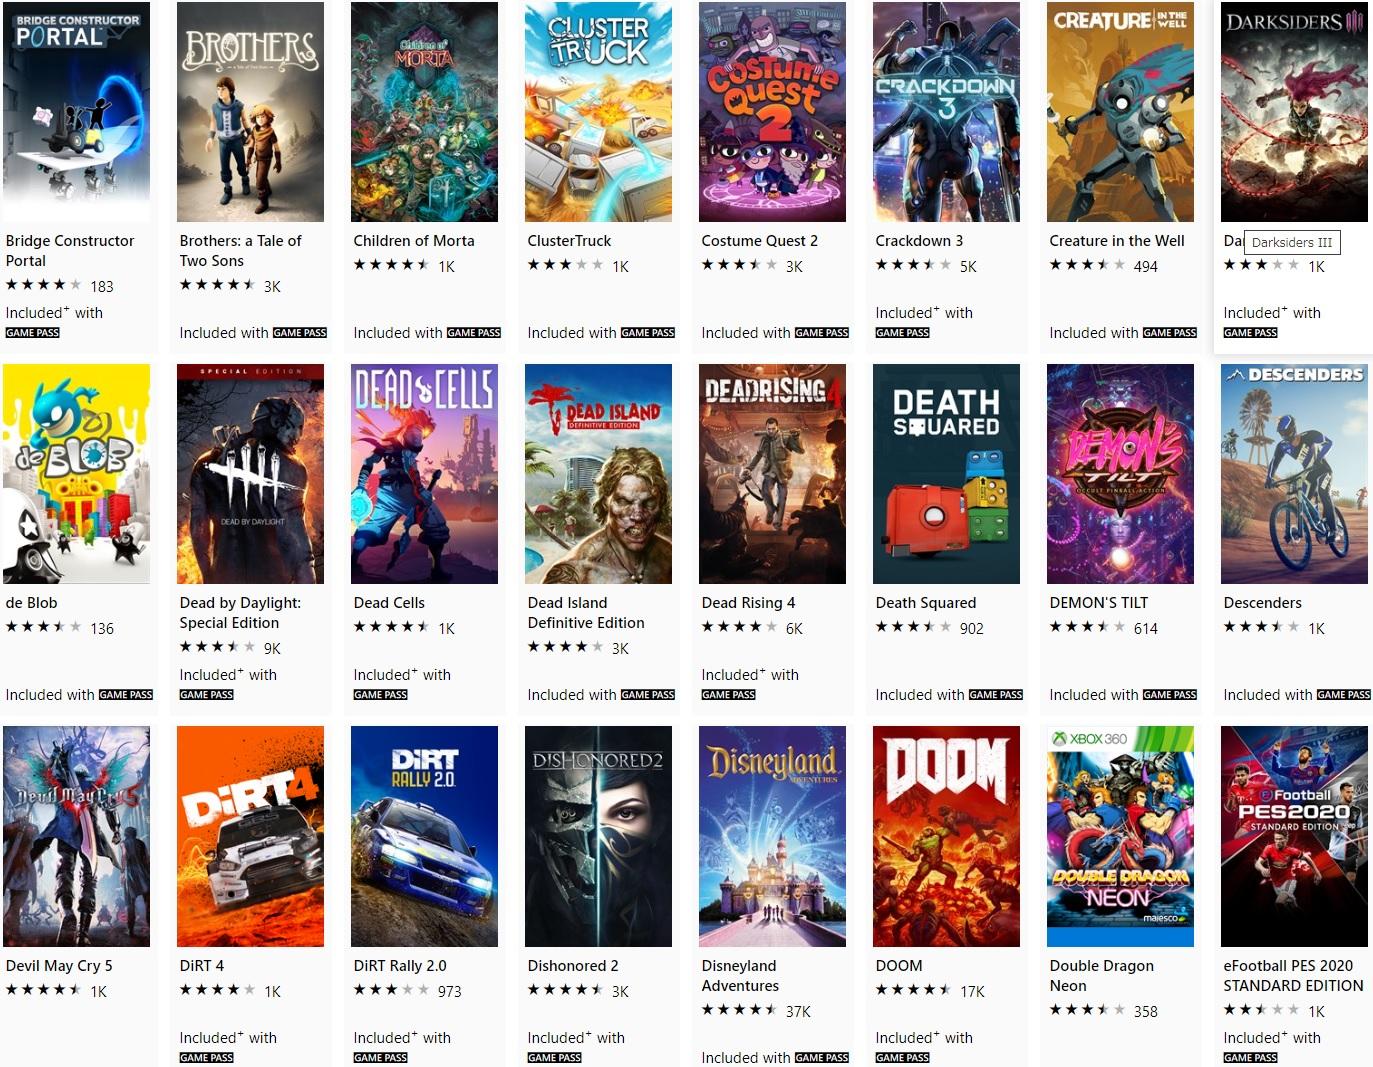 GfUuHHs - Xbox OneやPCでゲーム遊び放題、「Xbox Game Pass」4月14日よりサービス開始